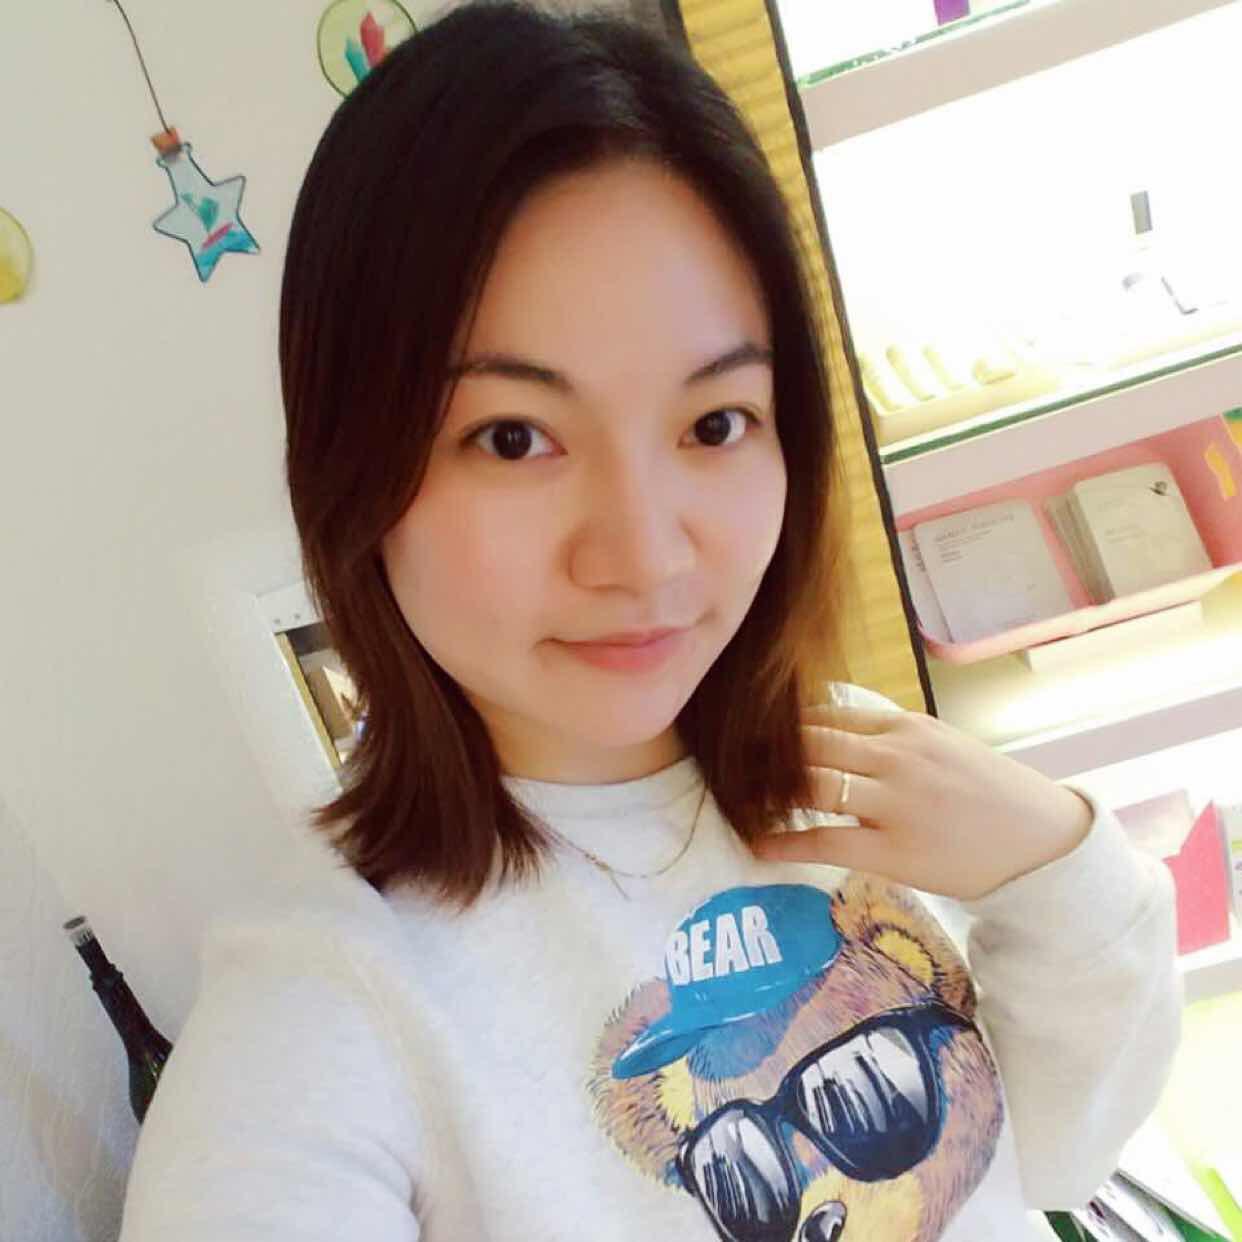 caijing/bhldjtgfyxgsgysyzyzjg_687.html